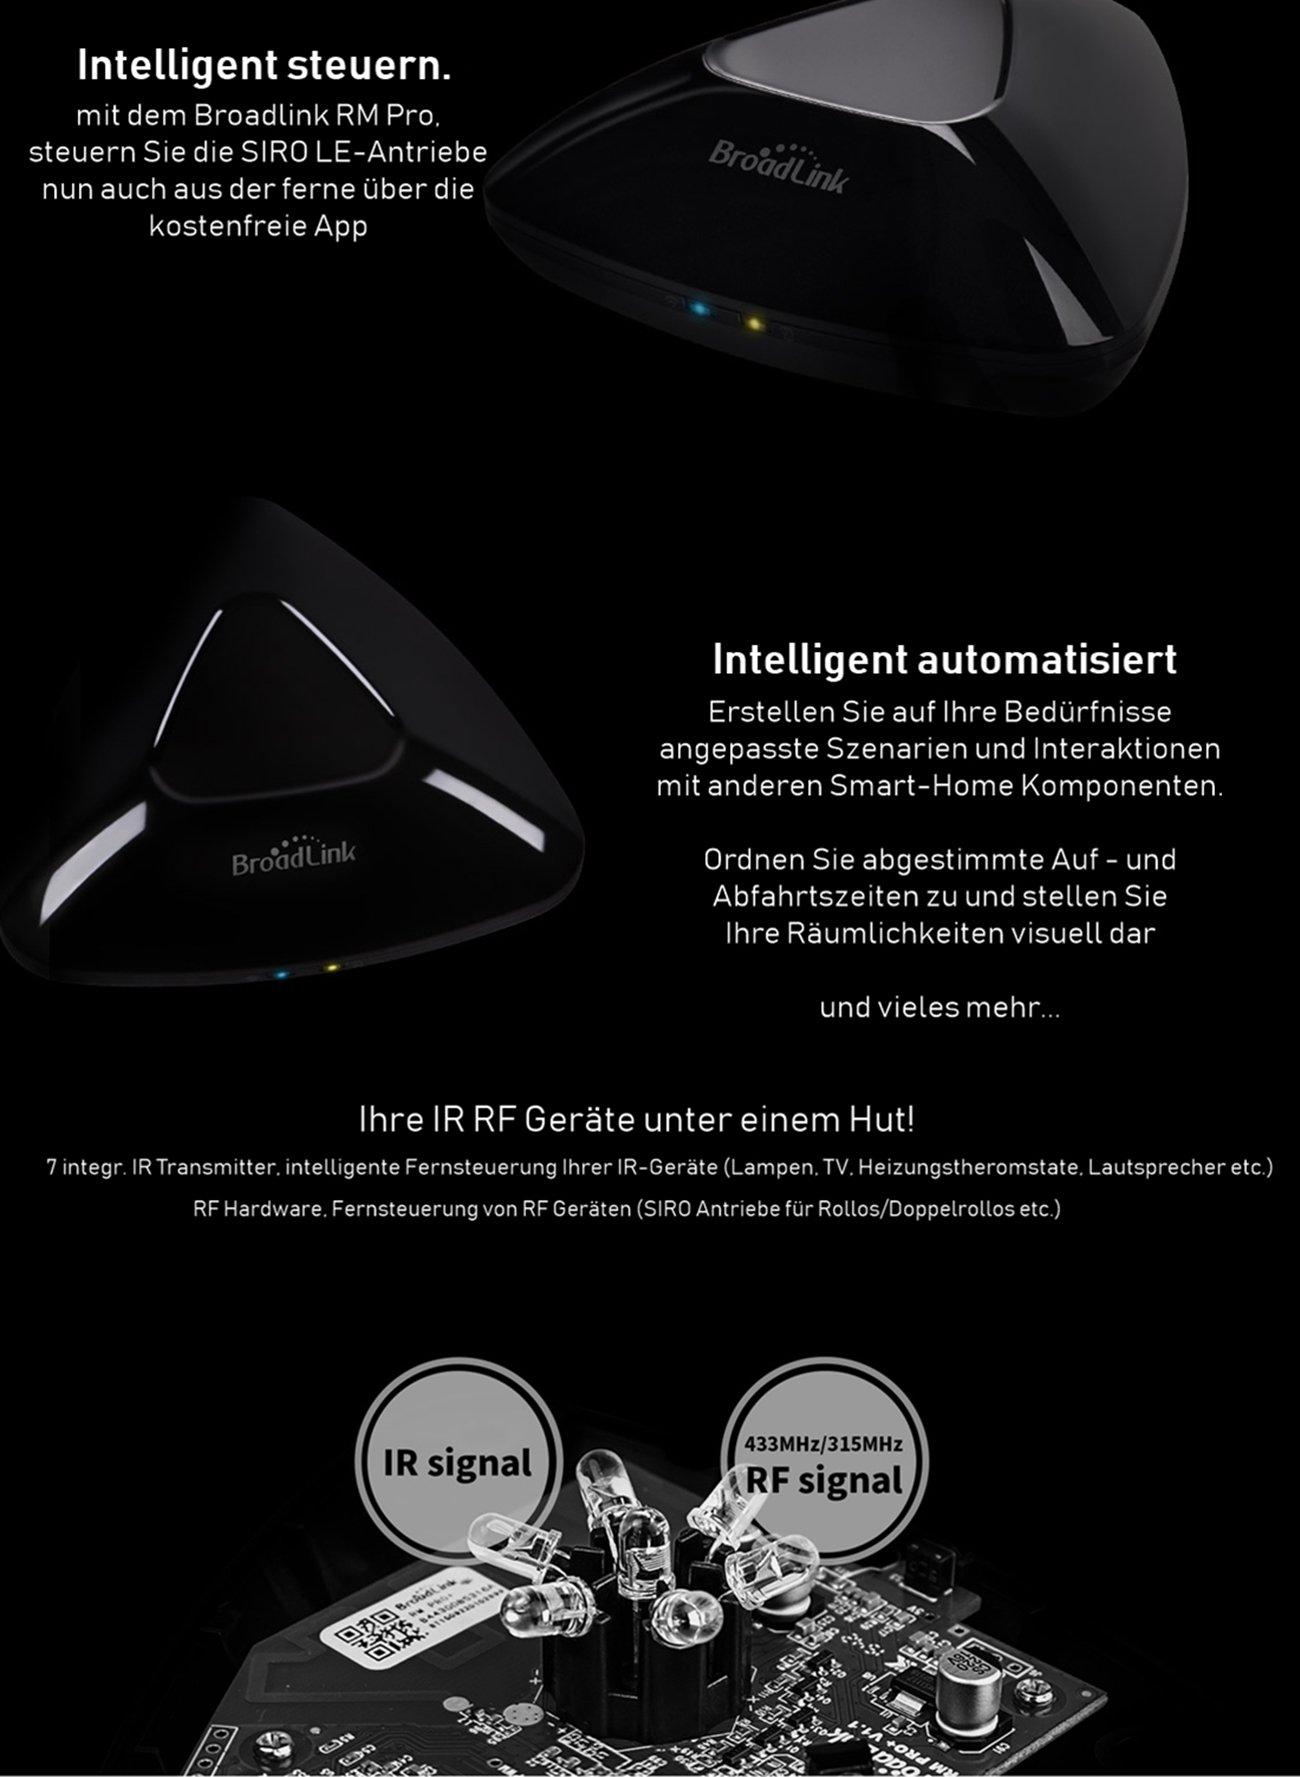 Broadlink RM Pro Smart Home Automation - Intelligente Fernbedienung ...